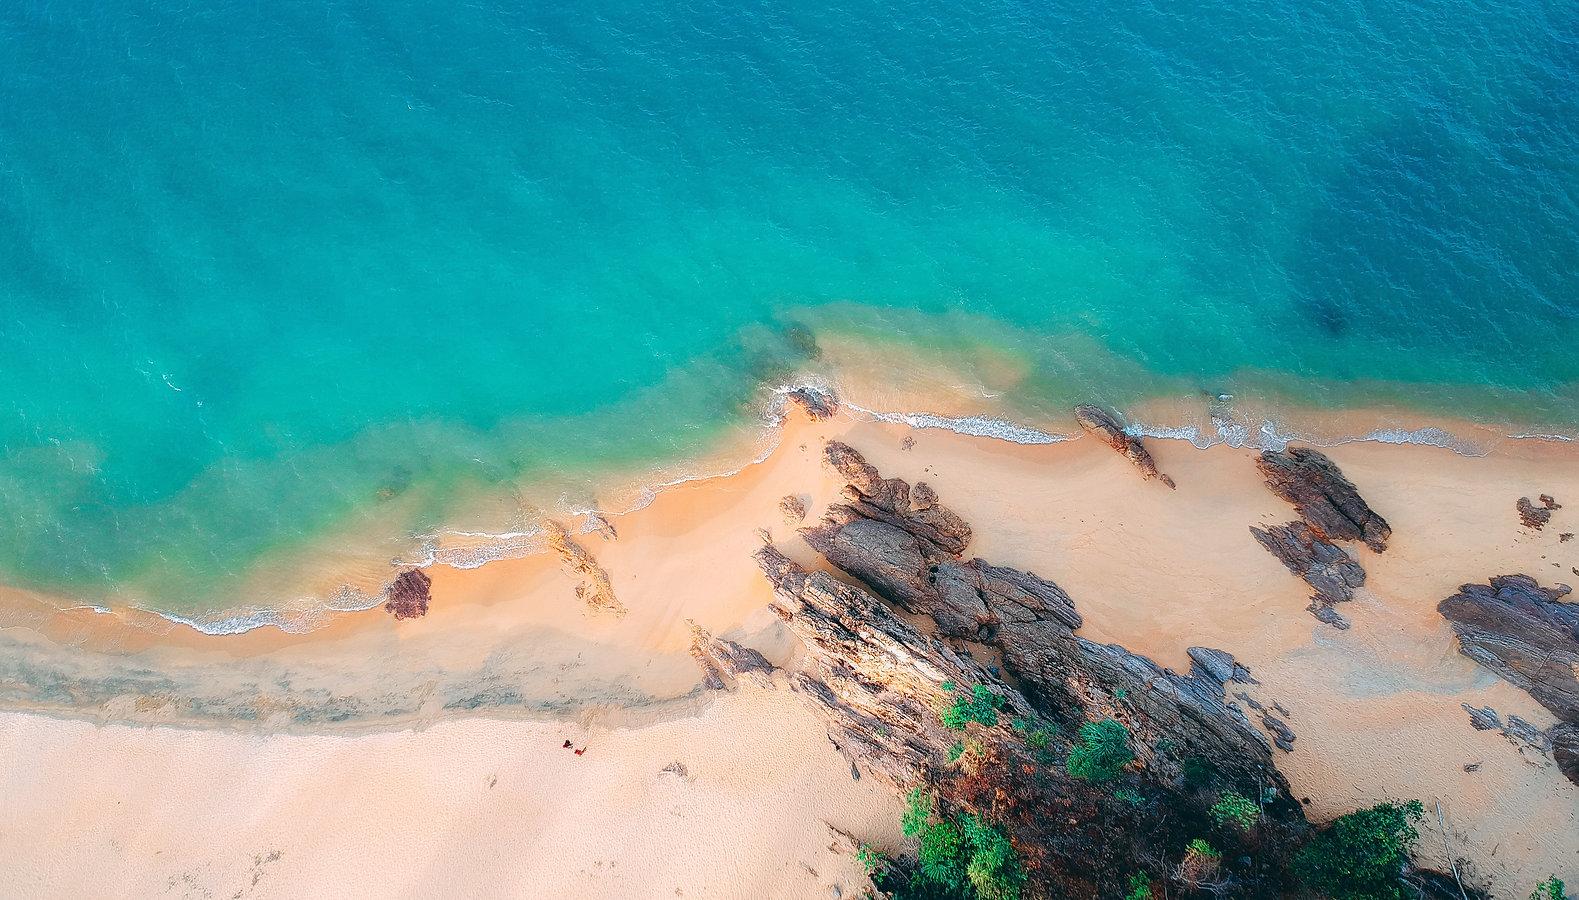 aerial-shot-bay-beach-2355321.jpg